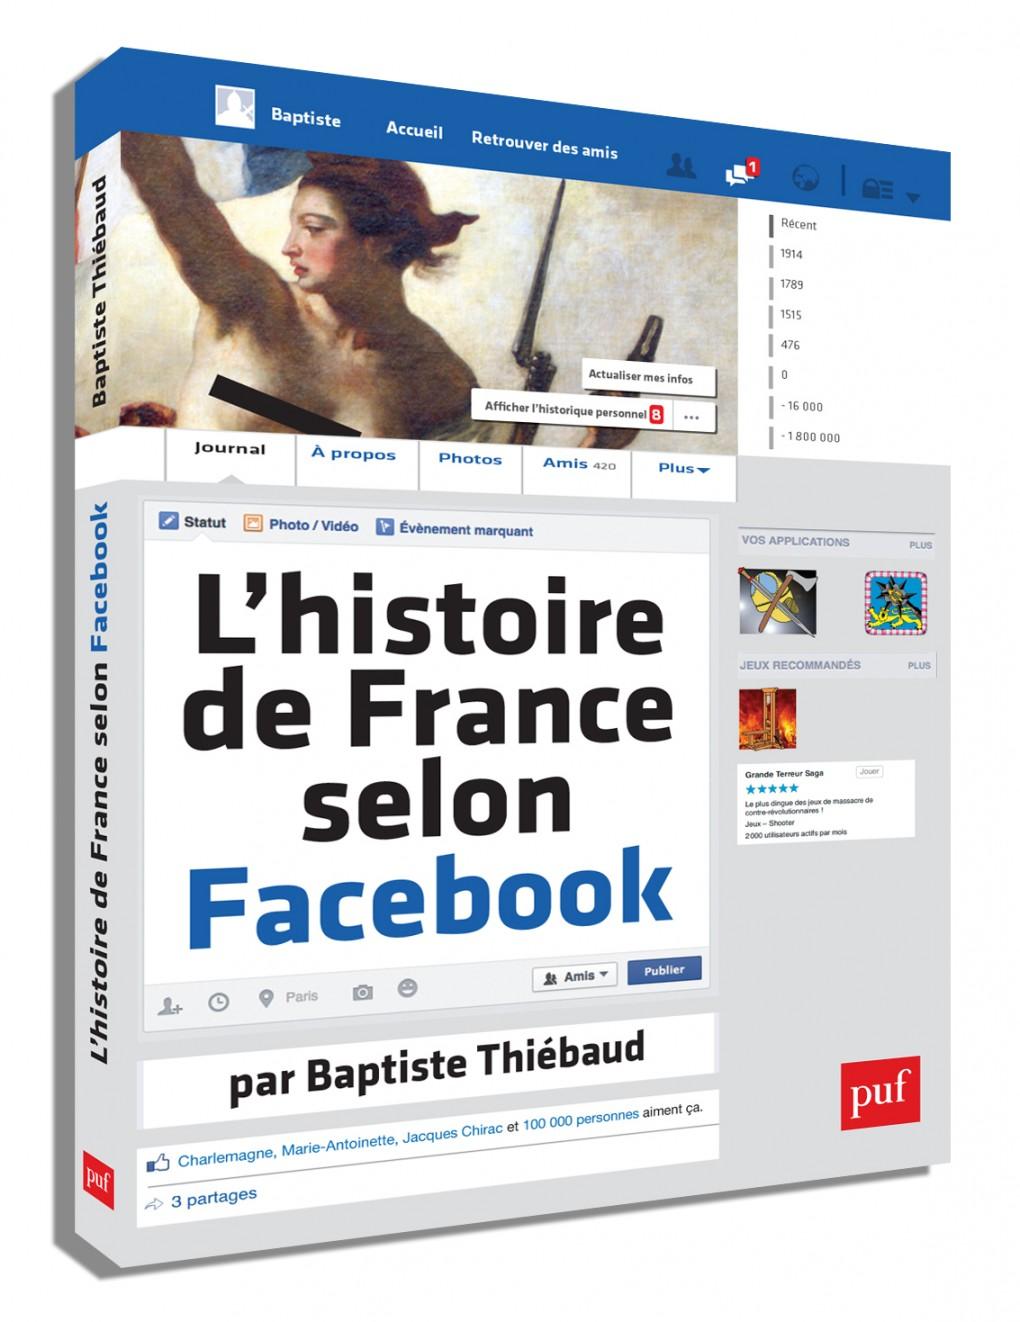 Histoire-Facebook-larevuey1